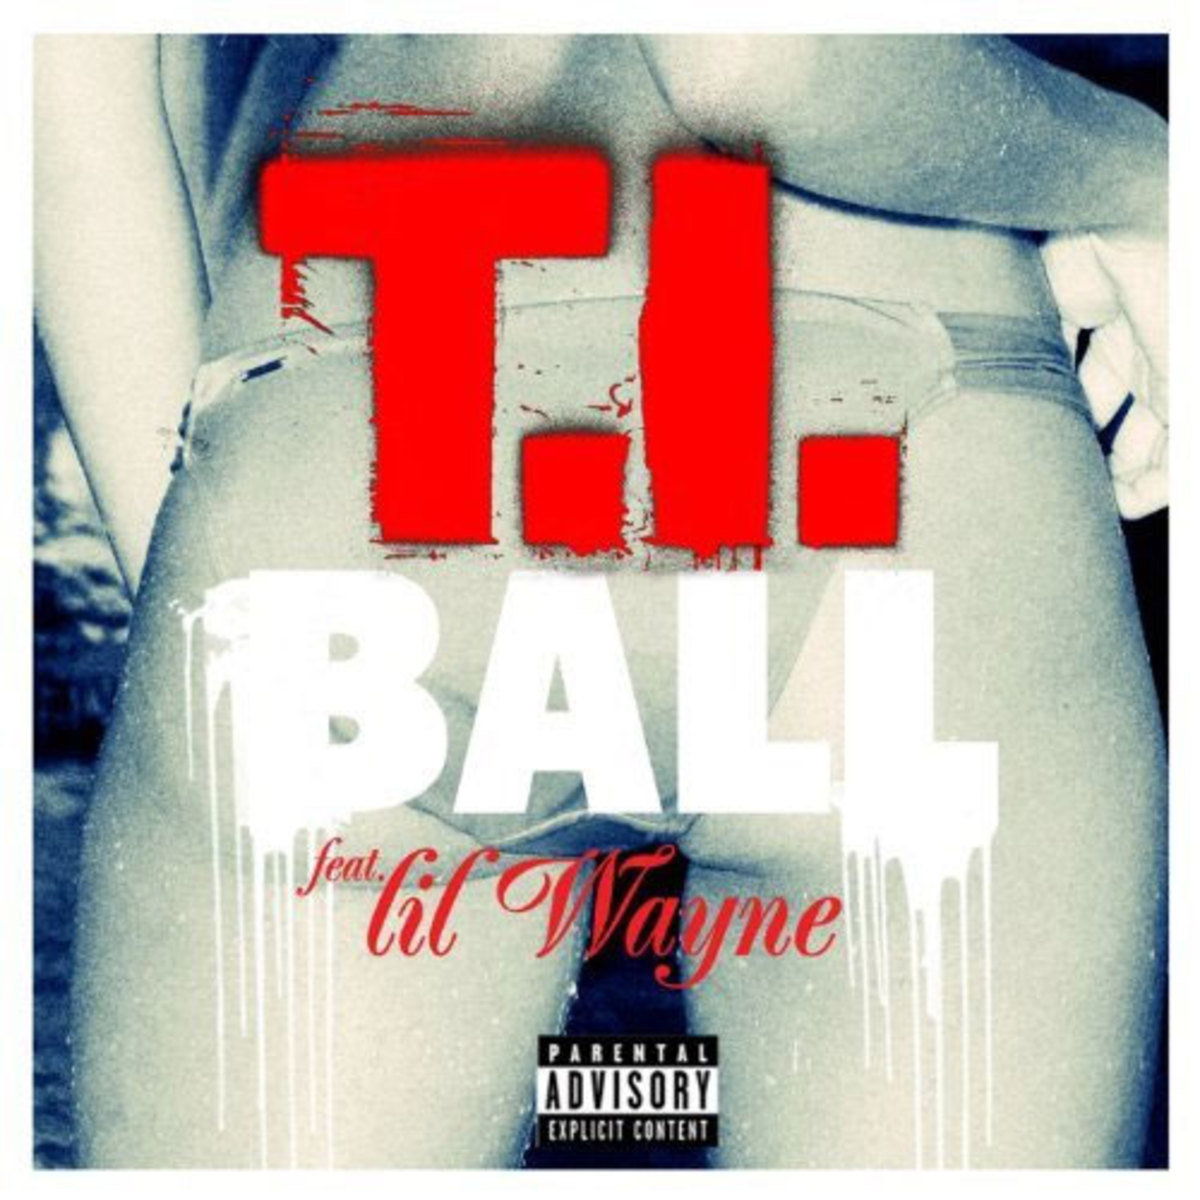 ti-ball.jpg